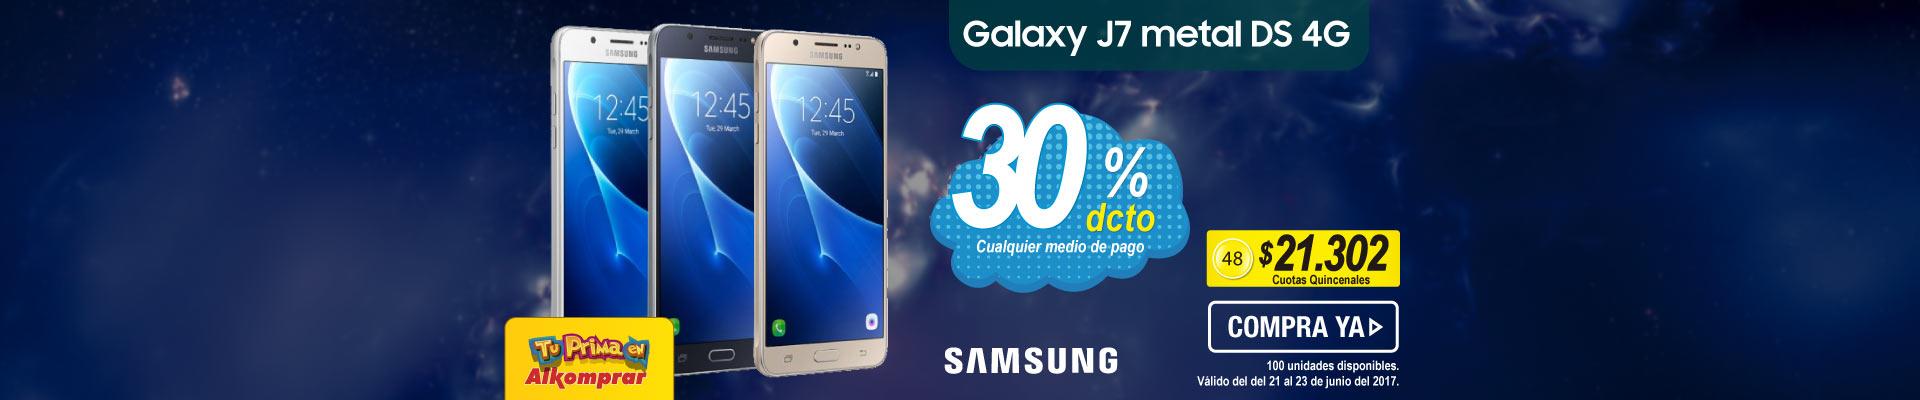 Celular SAMSUNG Galaxy J7 Metal DS 4G - banner principal